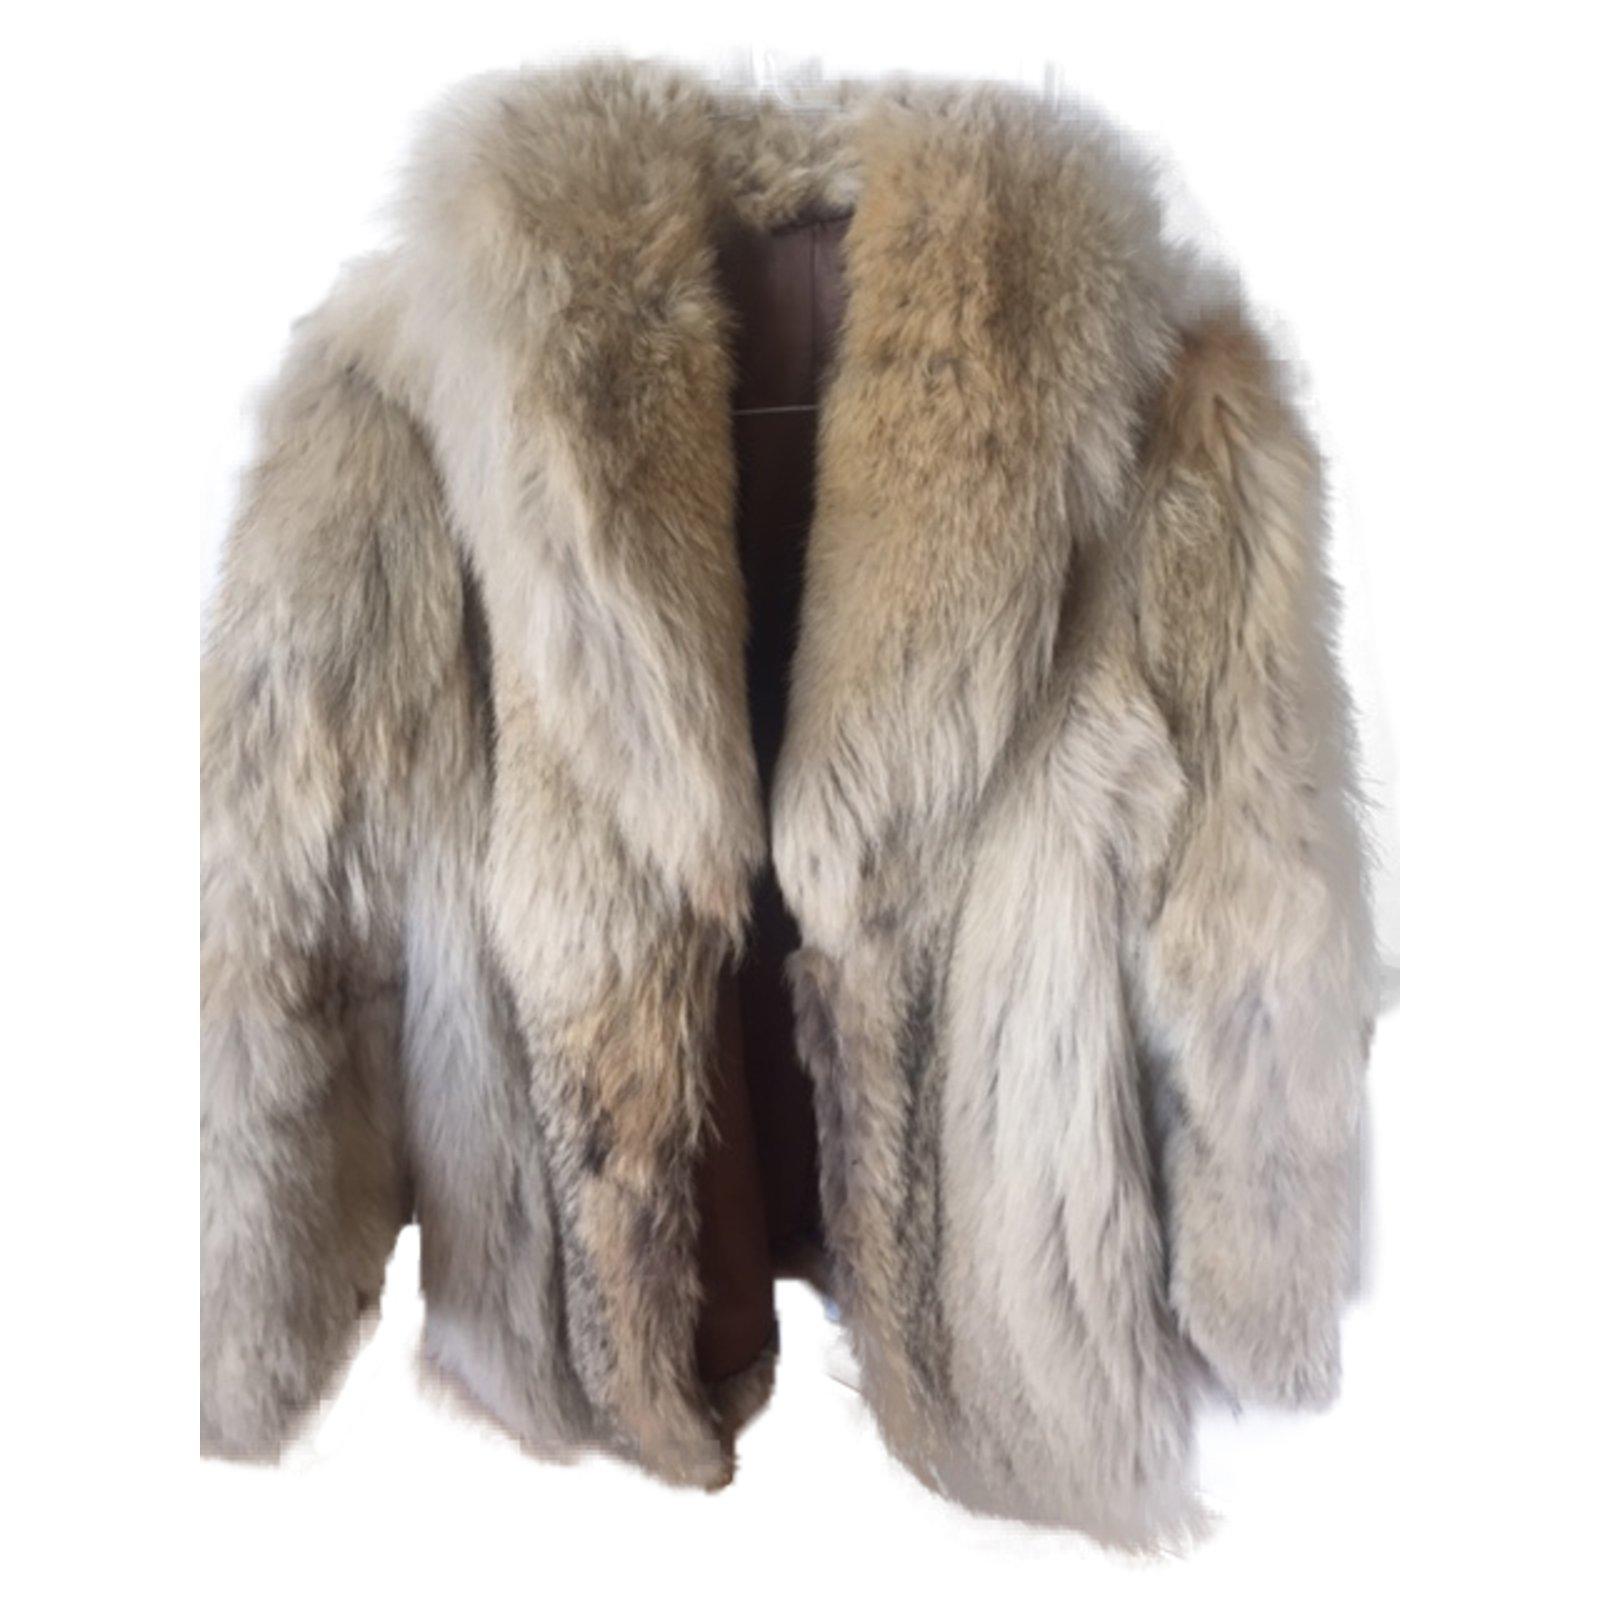 manteaux autre marque manteau de fourrure renard fourrure beige joli closet. Black Bedroom Furniture Sets. Home Design Ideas